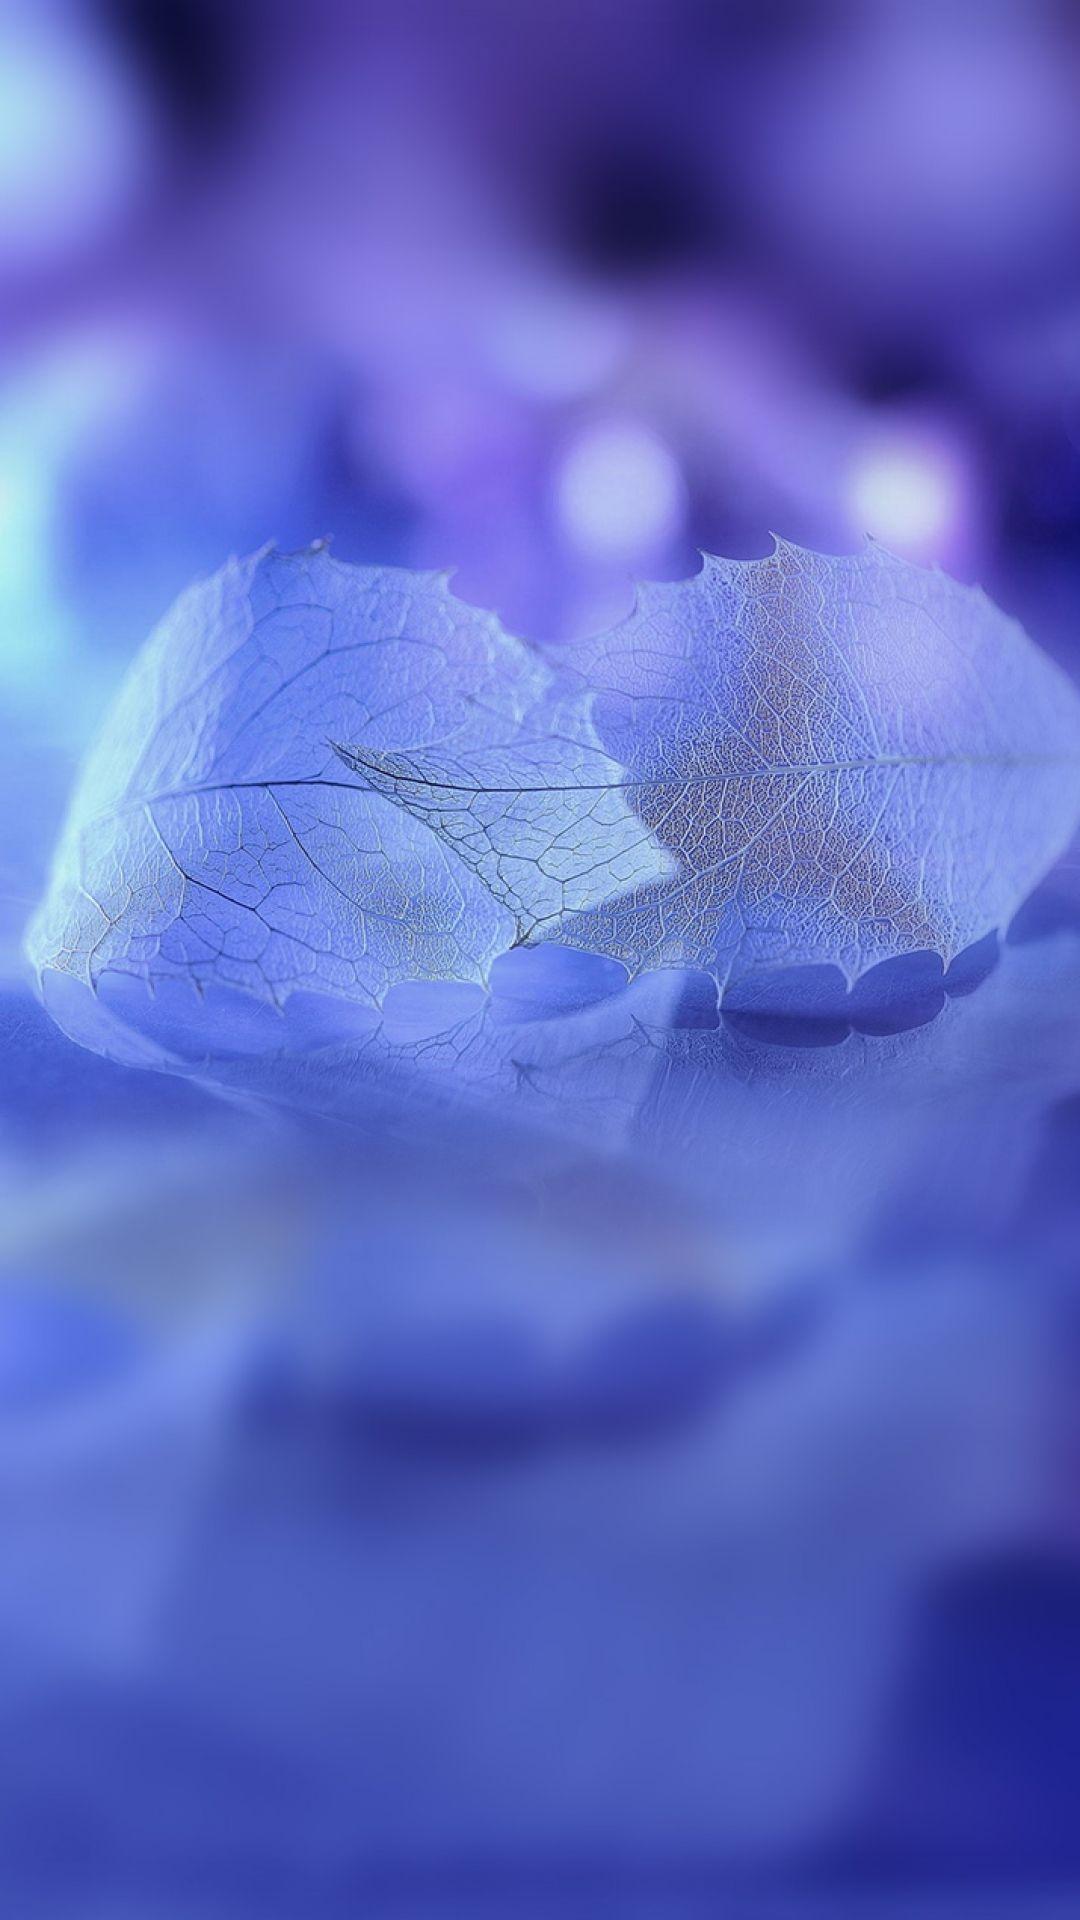 1080x1920 Background HD Wallpaper - 526 ...